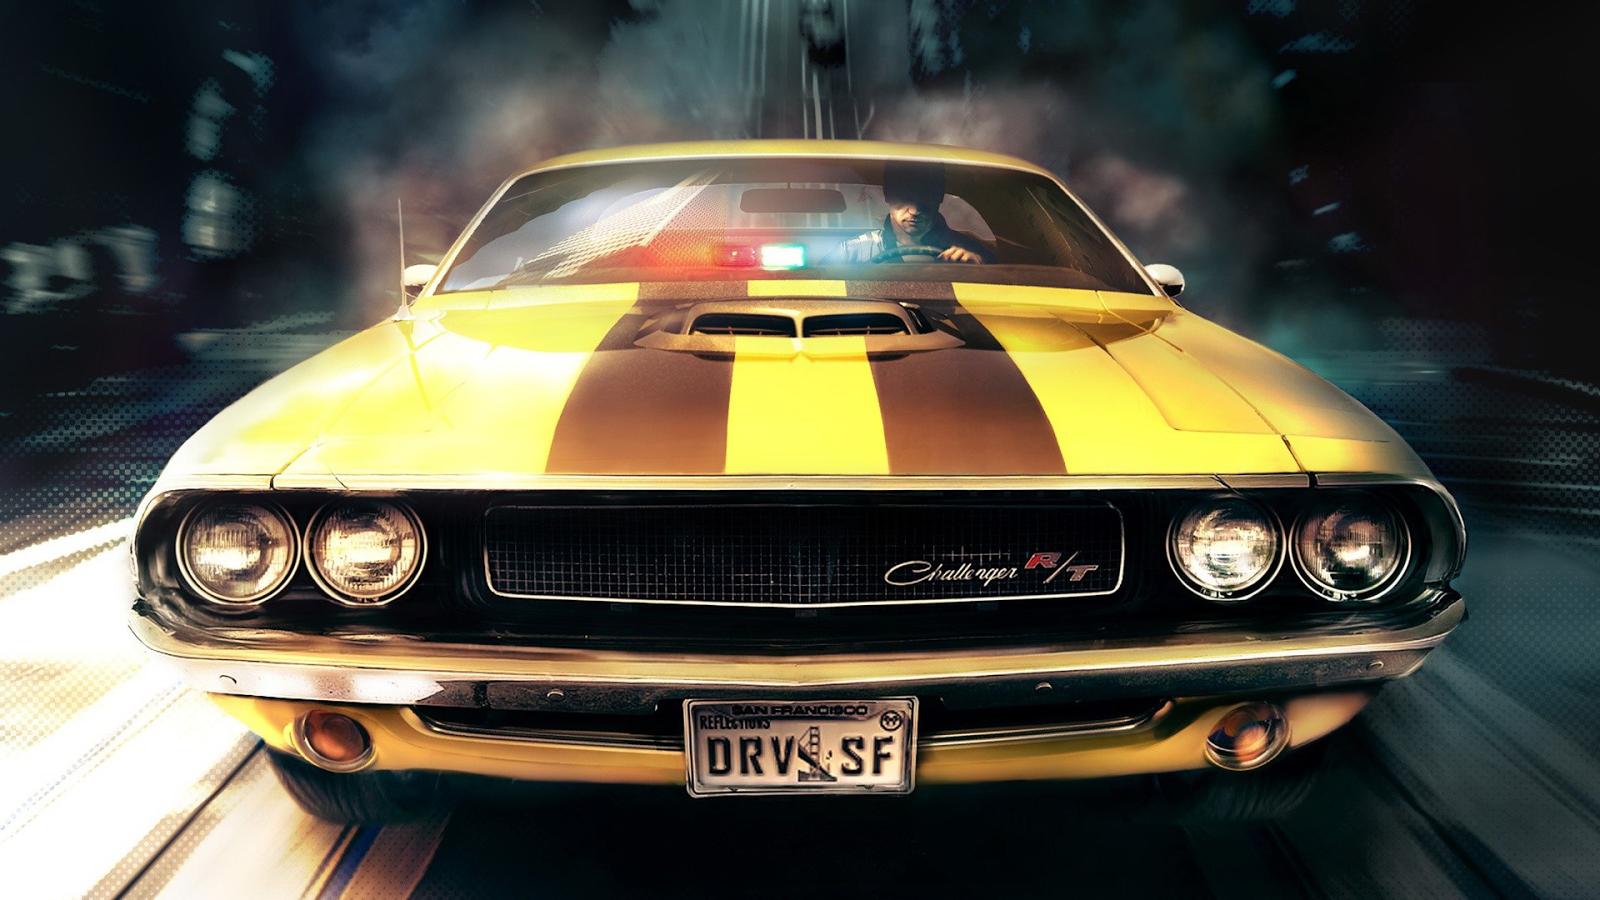 Classic Cars Wallpaper Hd Muscle Car 1600x900 Wallpaper Teahub Io